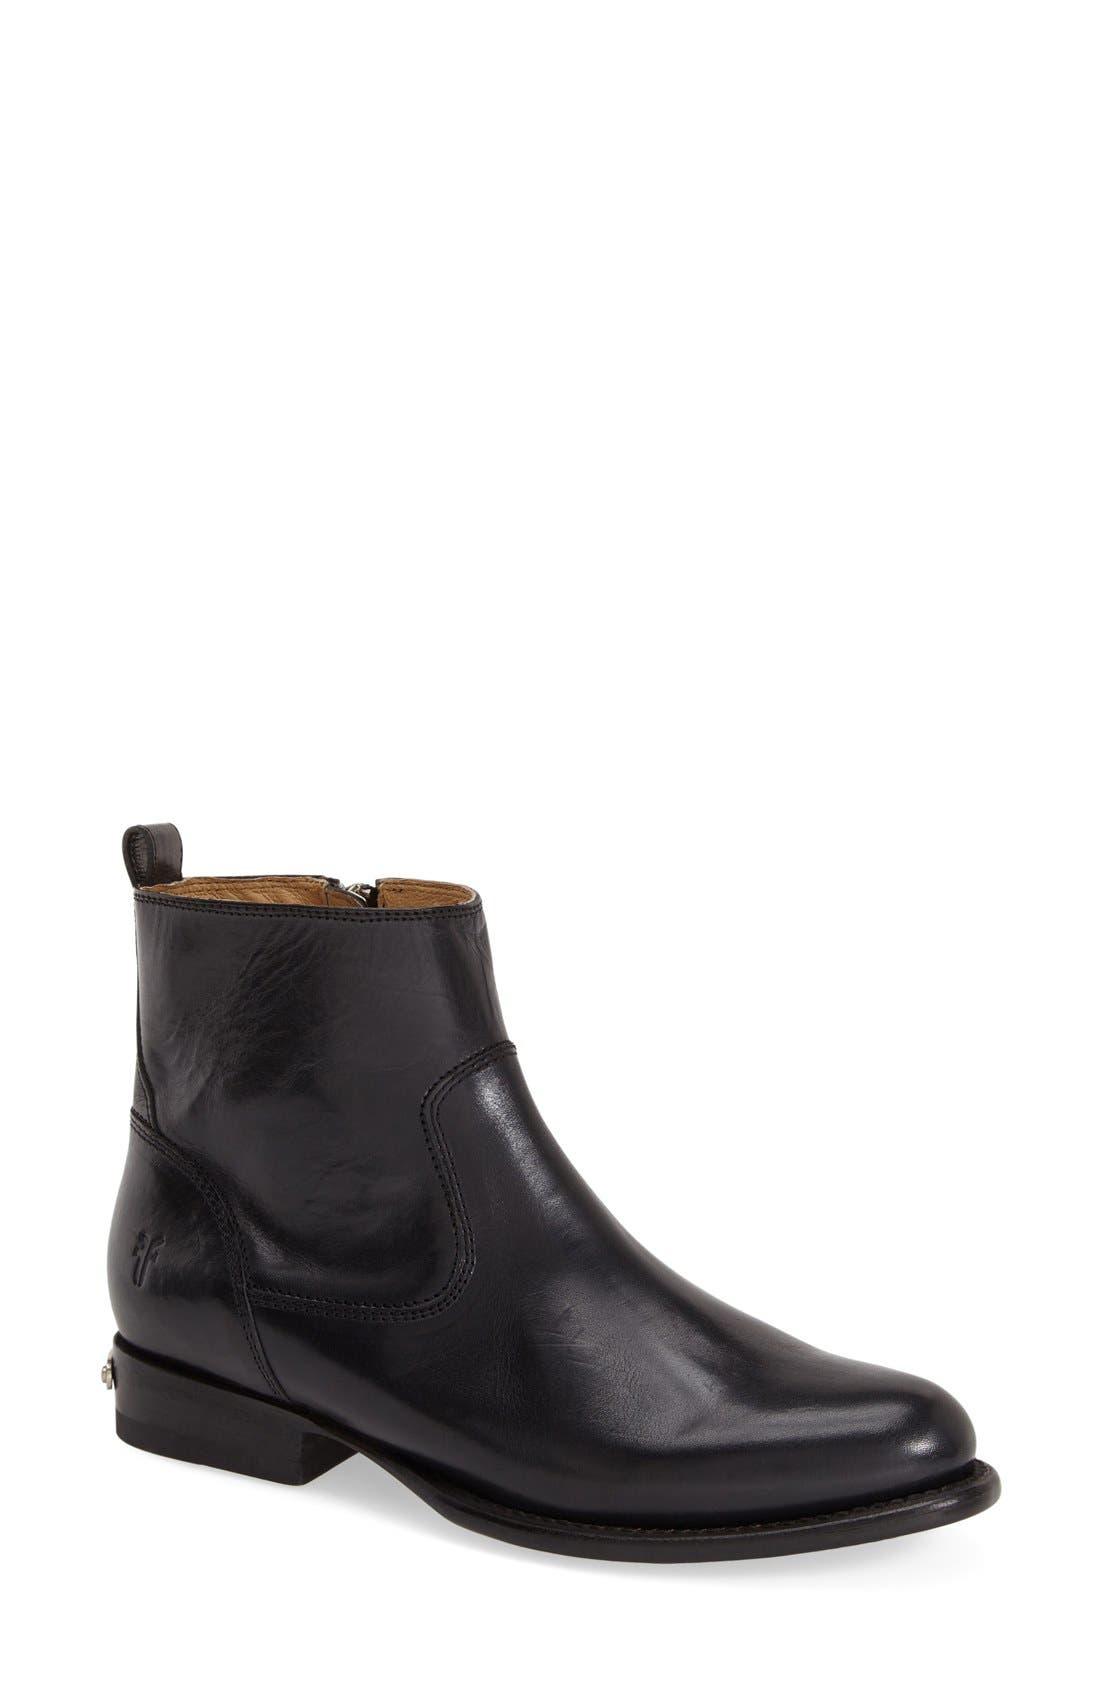 'Danielle' Ankle Boot, Main, color, 001